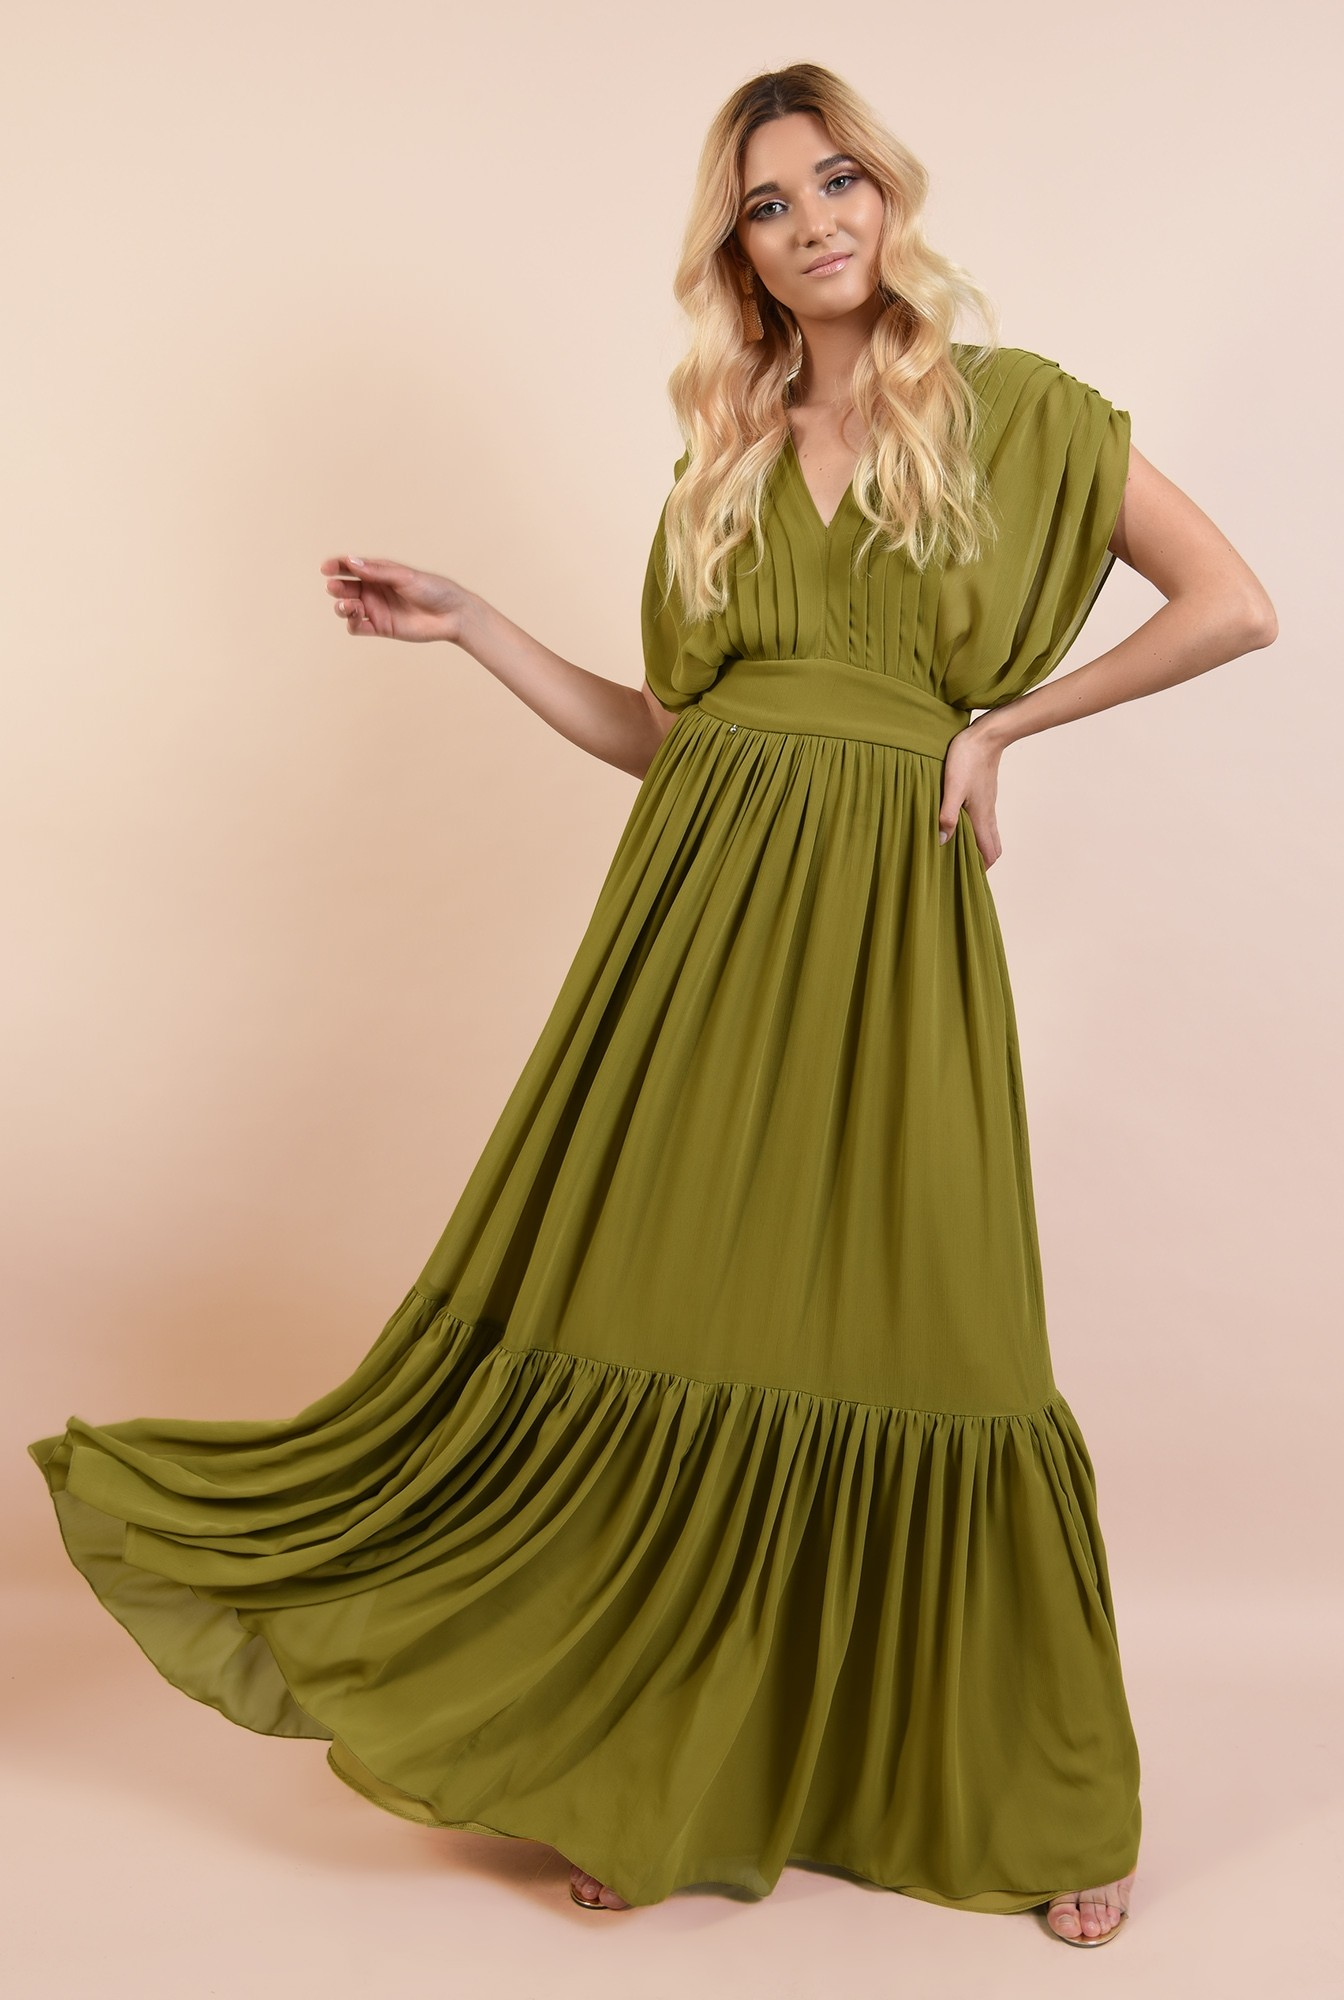 0 - rochie de seara, Poema, fronsata, talie cu betelie, pense inguste verticale, spate cu snur